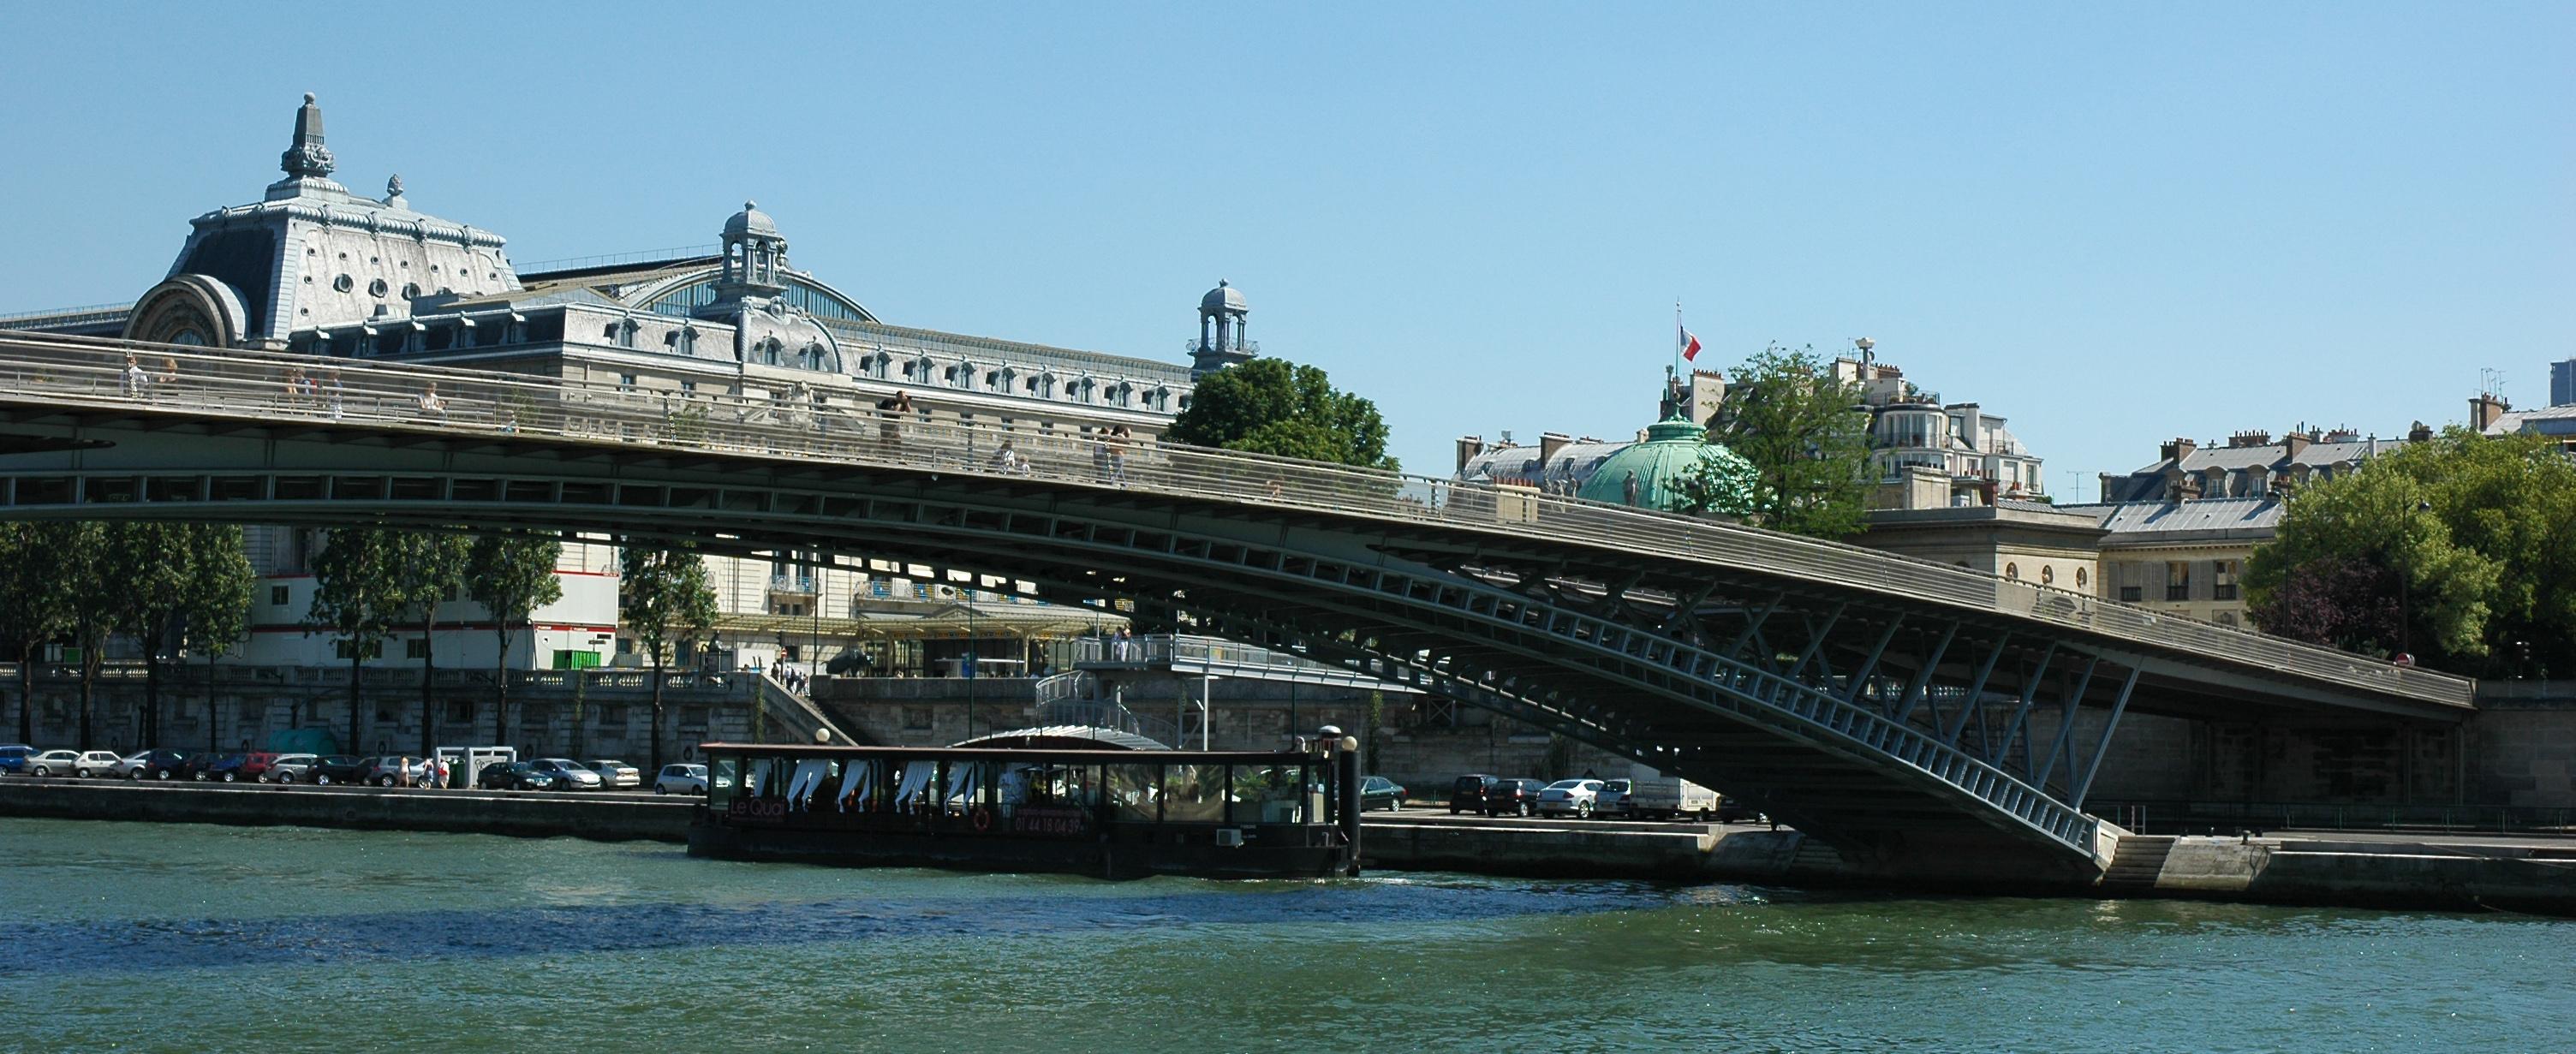 File:France Paris Passerelle Solferino 01.JPG - Wikimedia ...